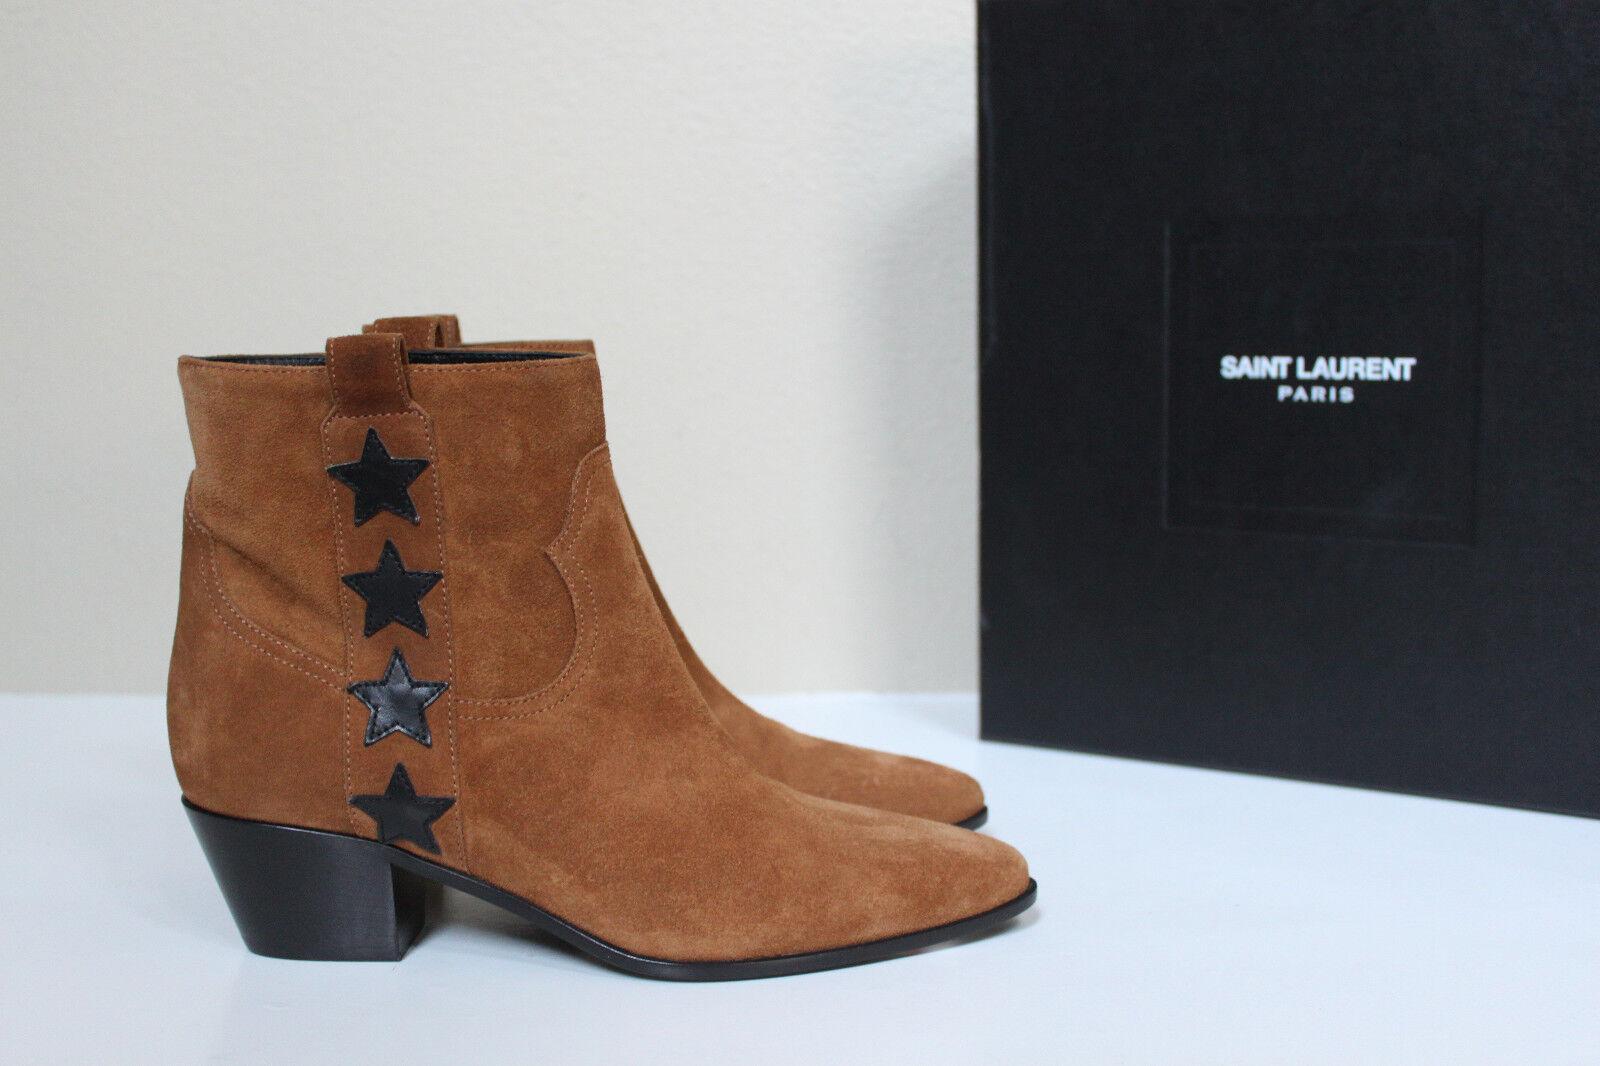 New sz 6 / 36.5 Saint Laurent Rock 40 Star Tan Suede Ankle Bootie Low Heel Shoes